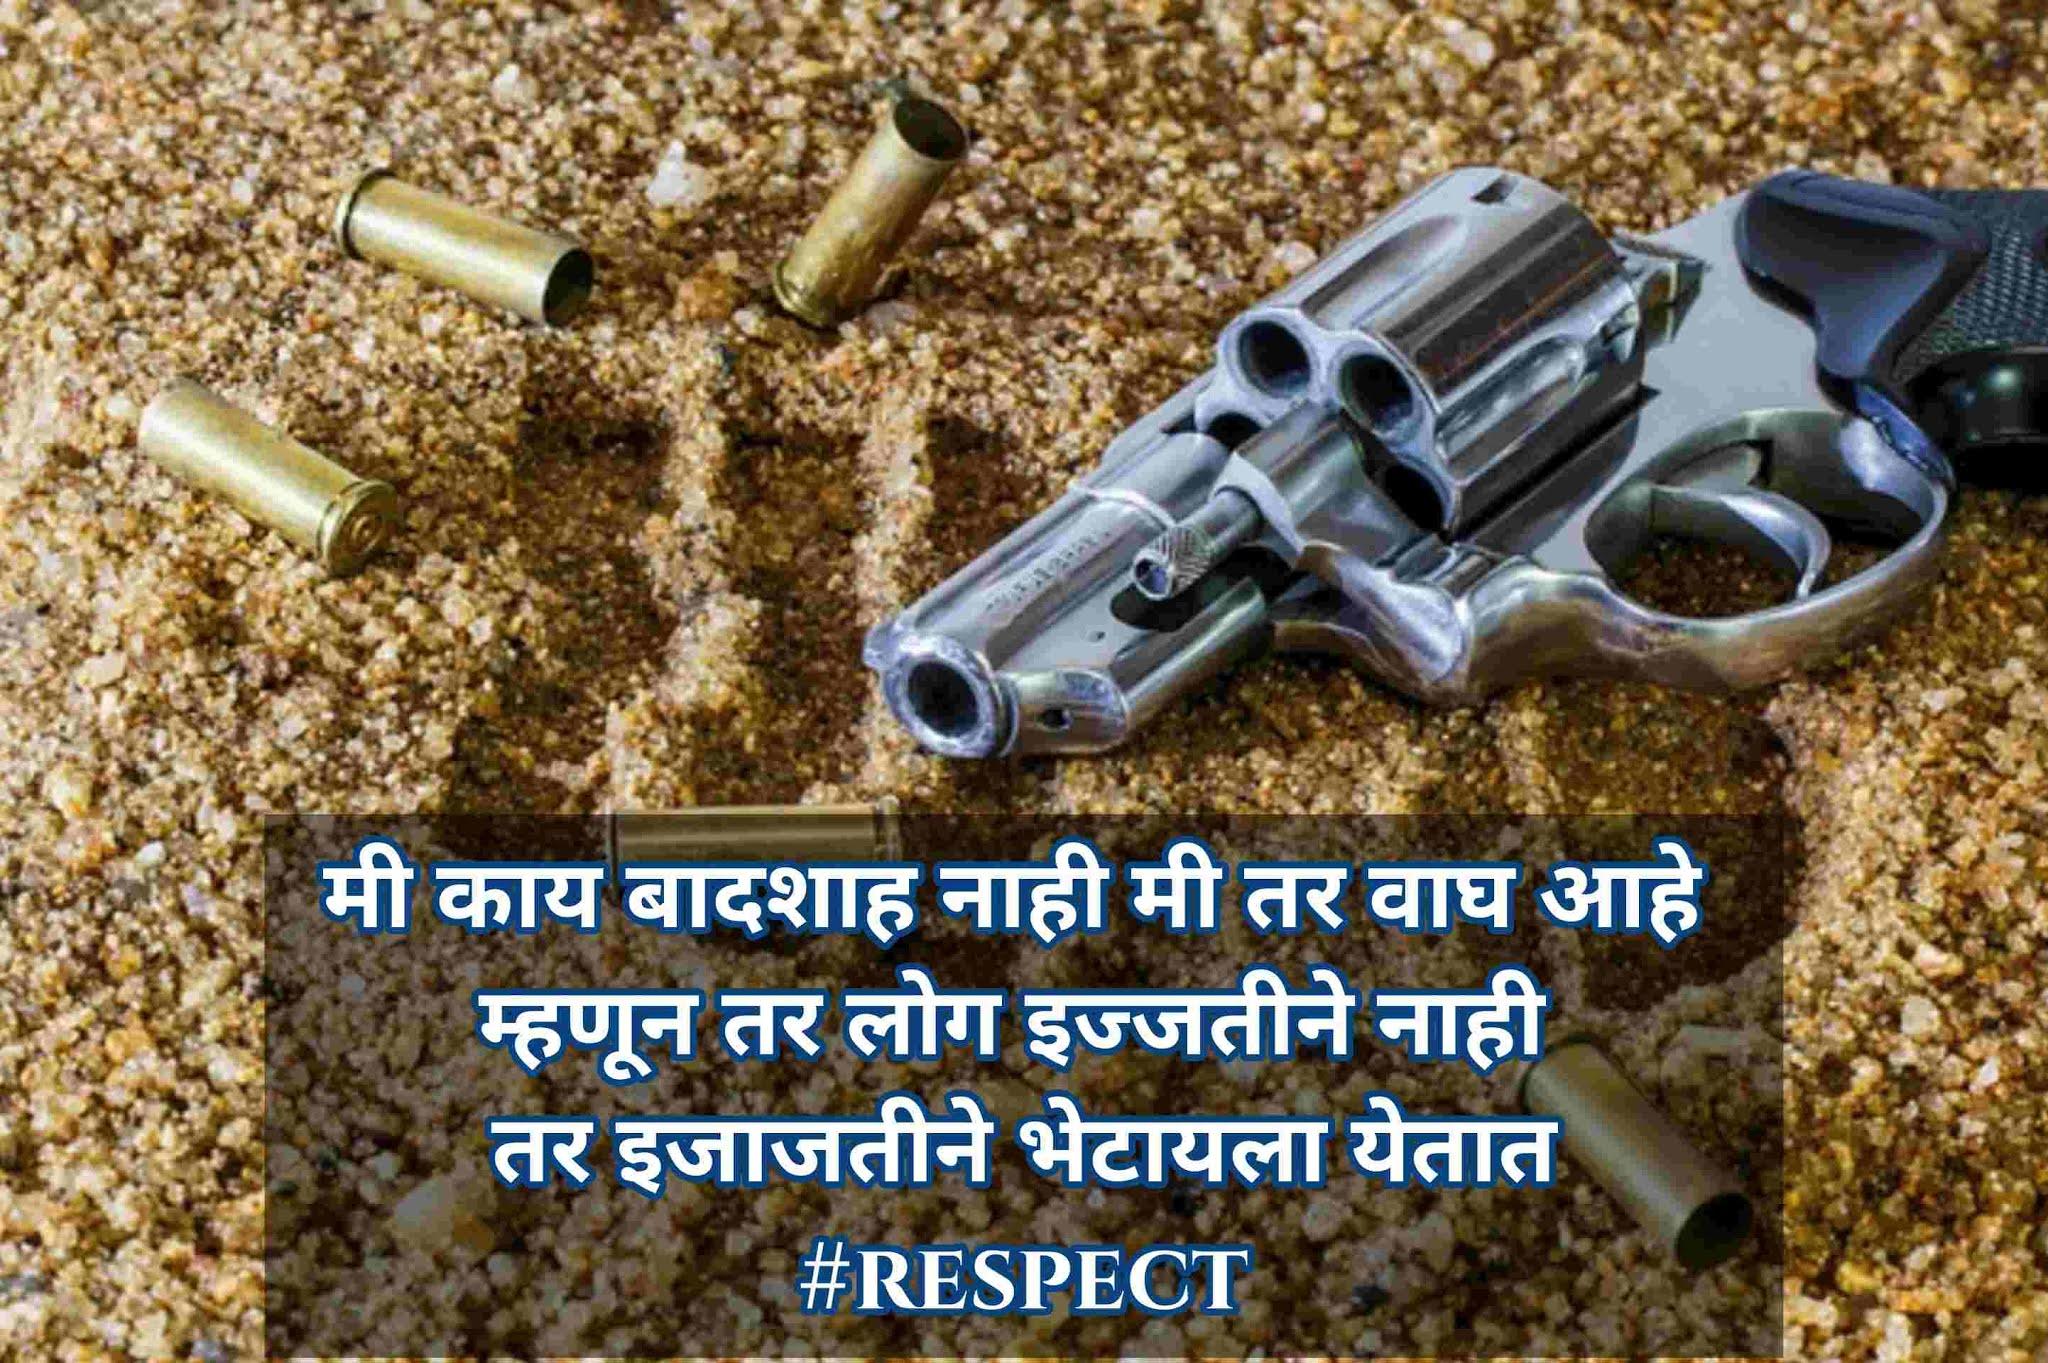 2 Line Attitude Shayari In marathi खतरनाक स्टाइल और एटीट्यूड शायरी इन मराठी